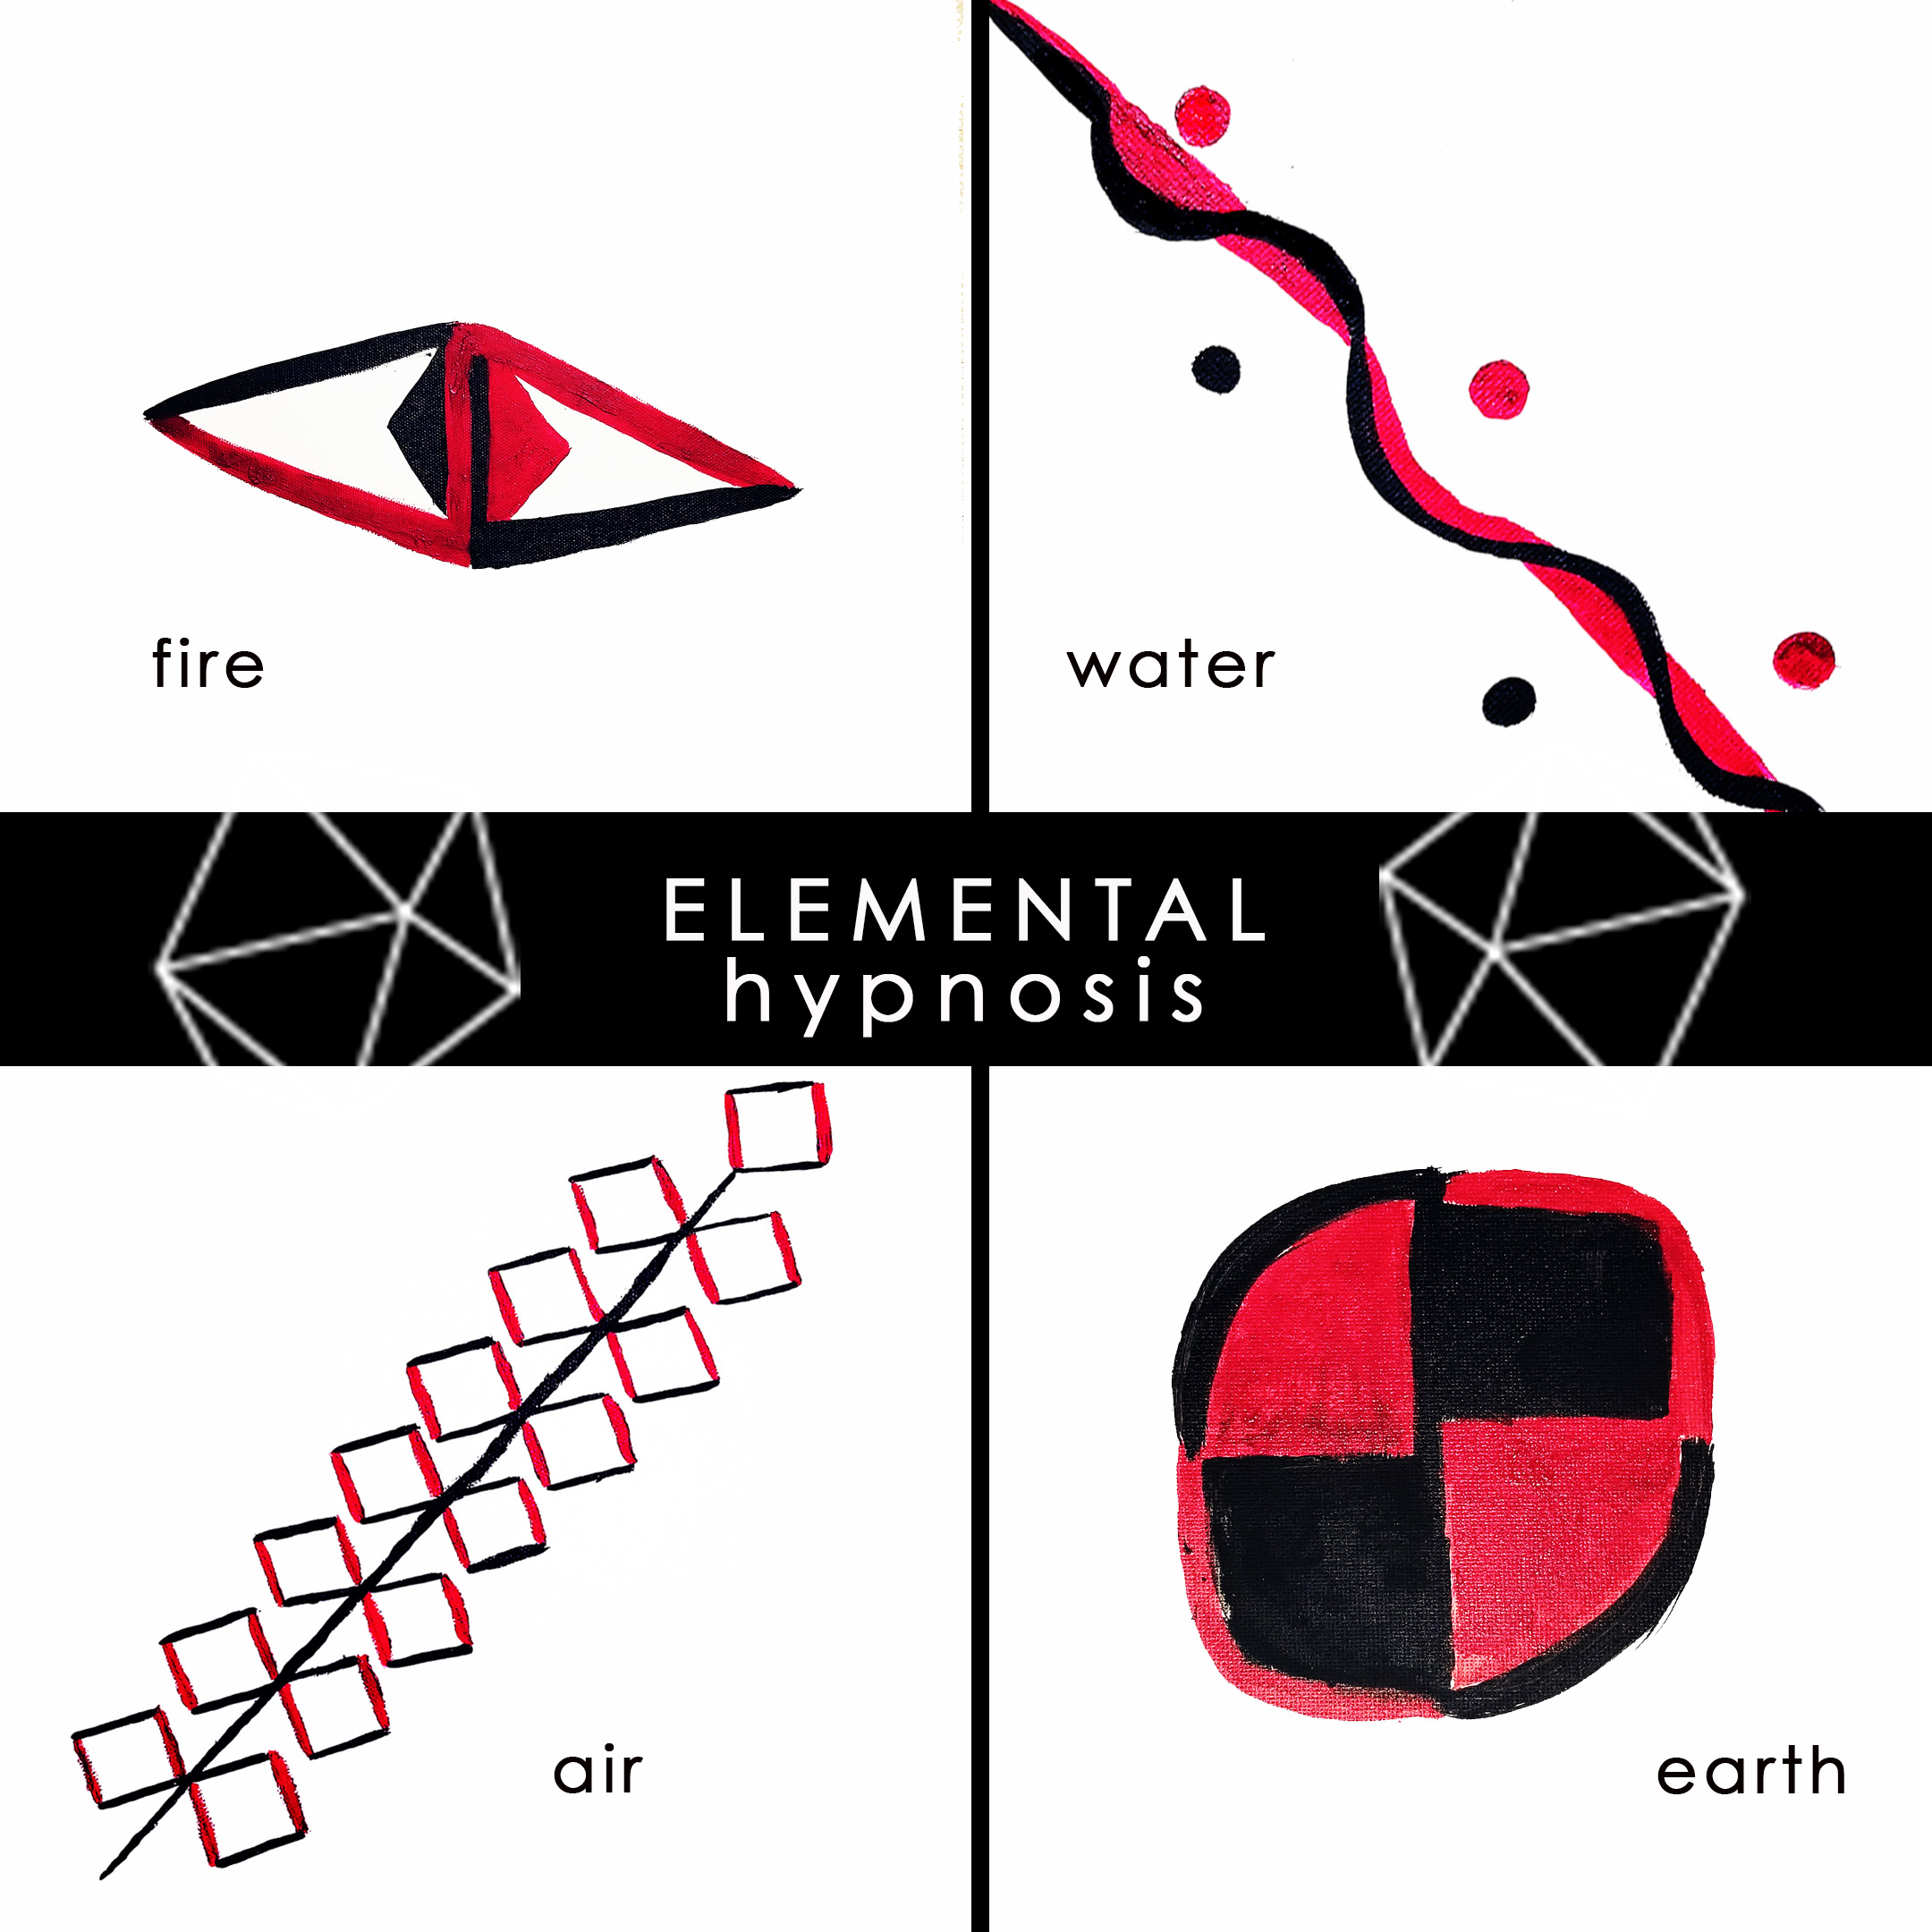 ElementalHypnosis.jpg